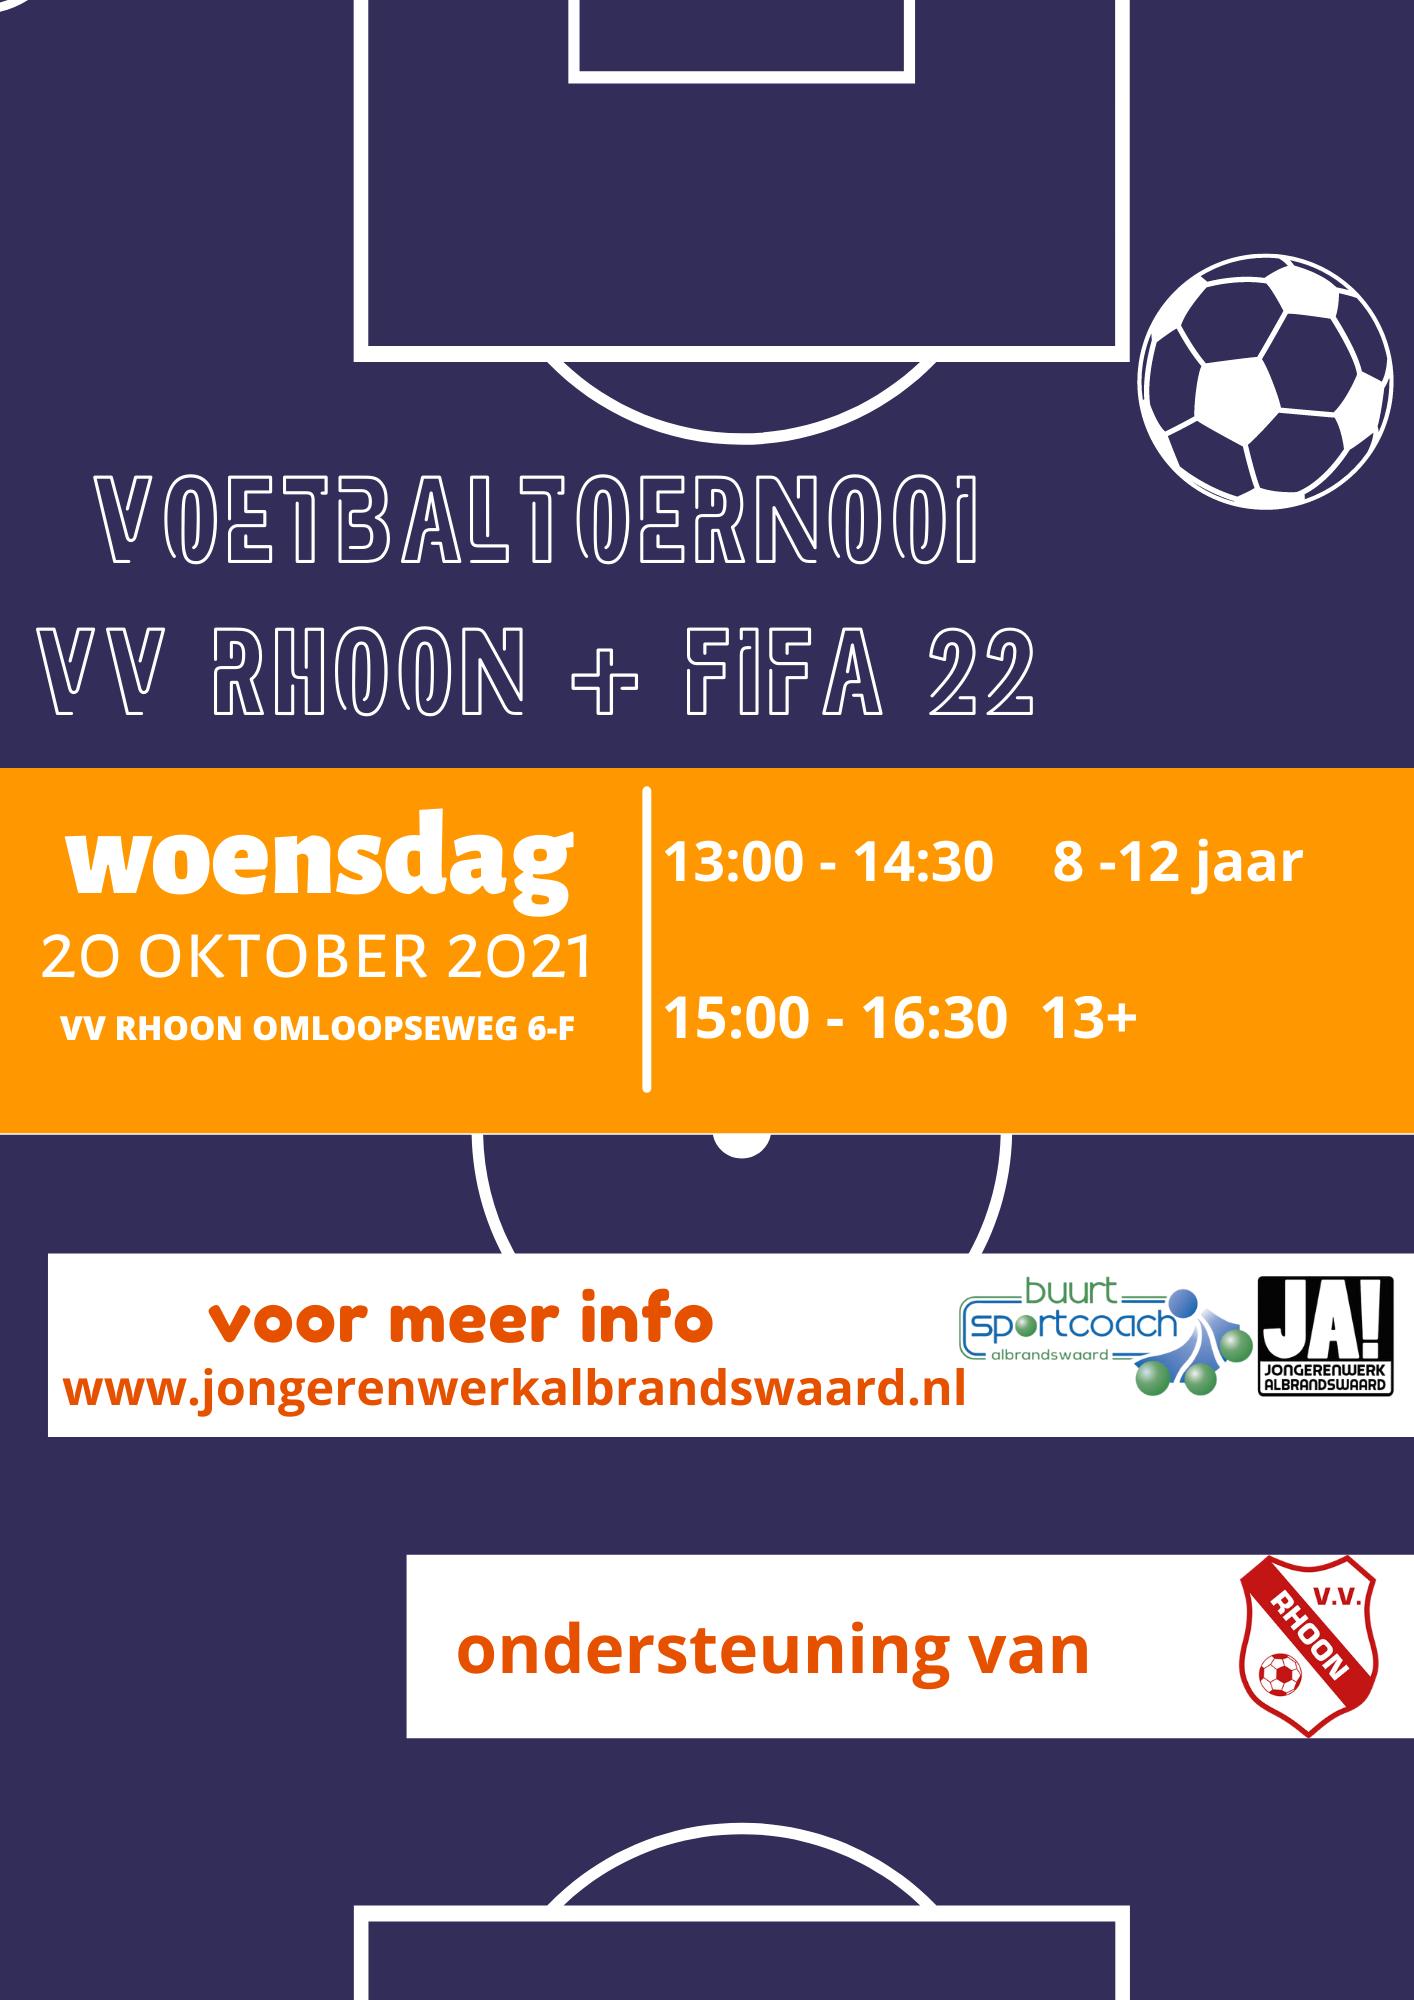 Woensdag 20 oktober voetbaltoernooi   FIFA22